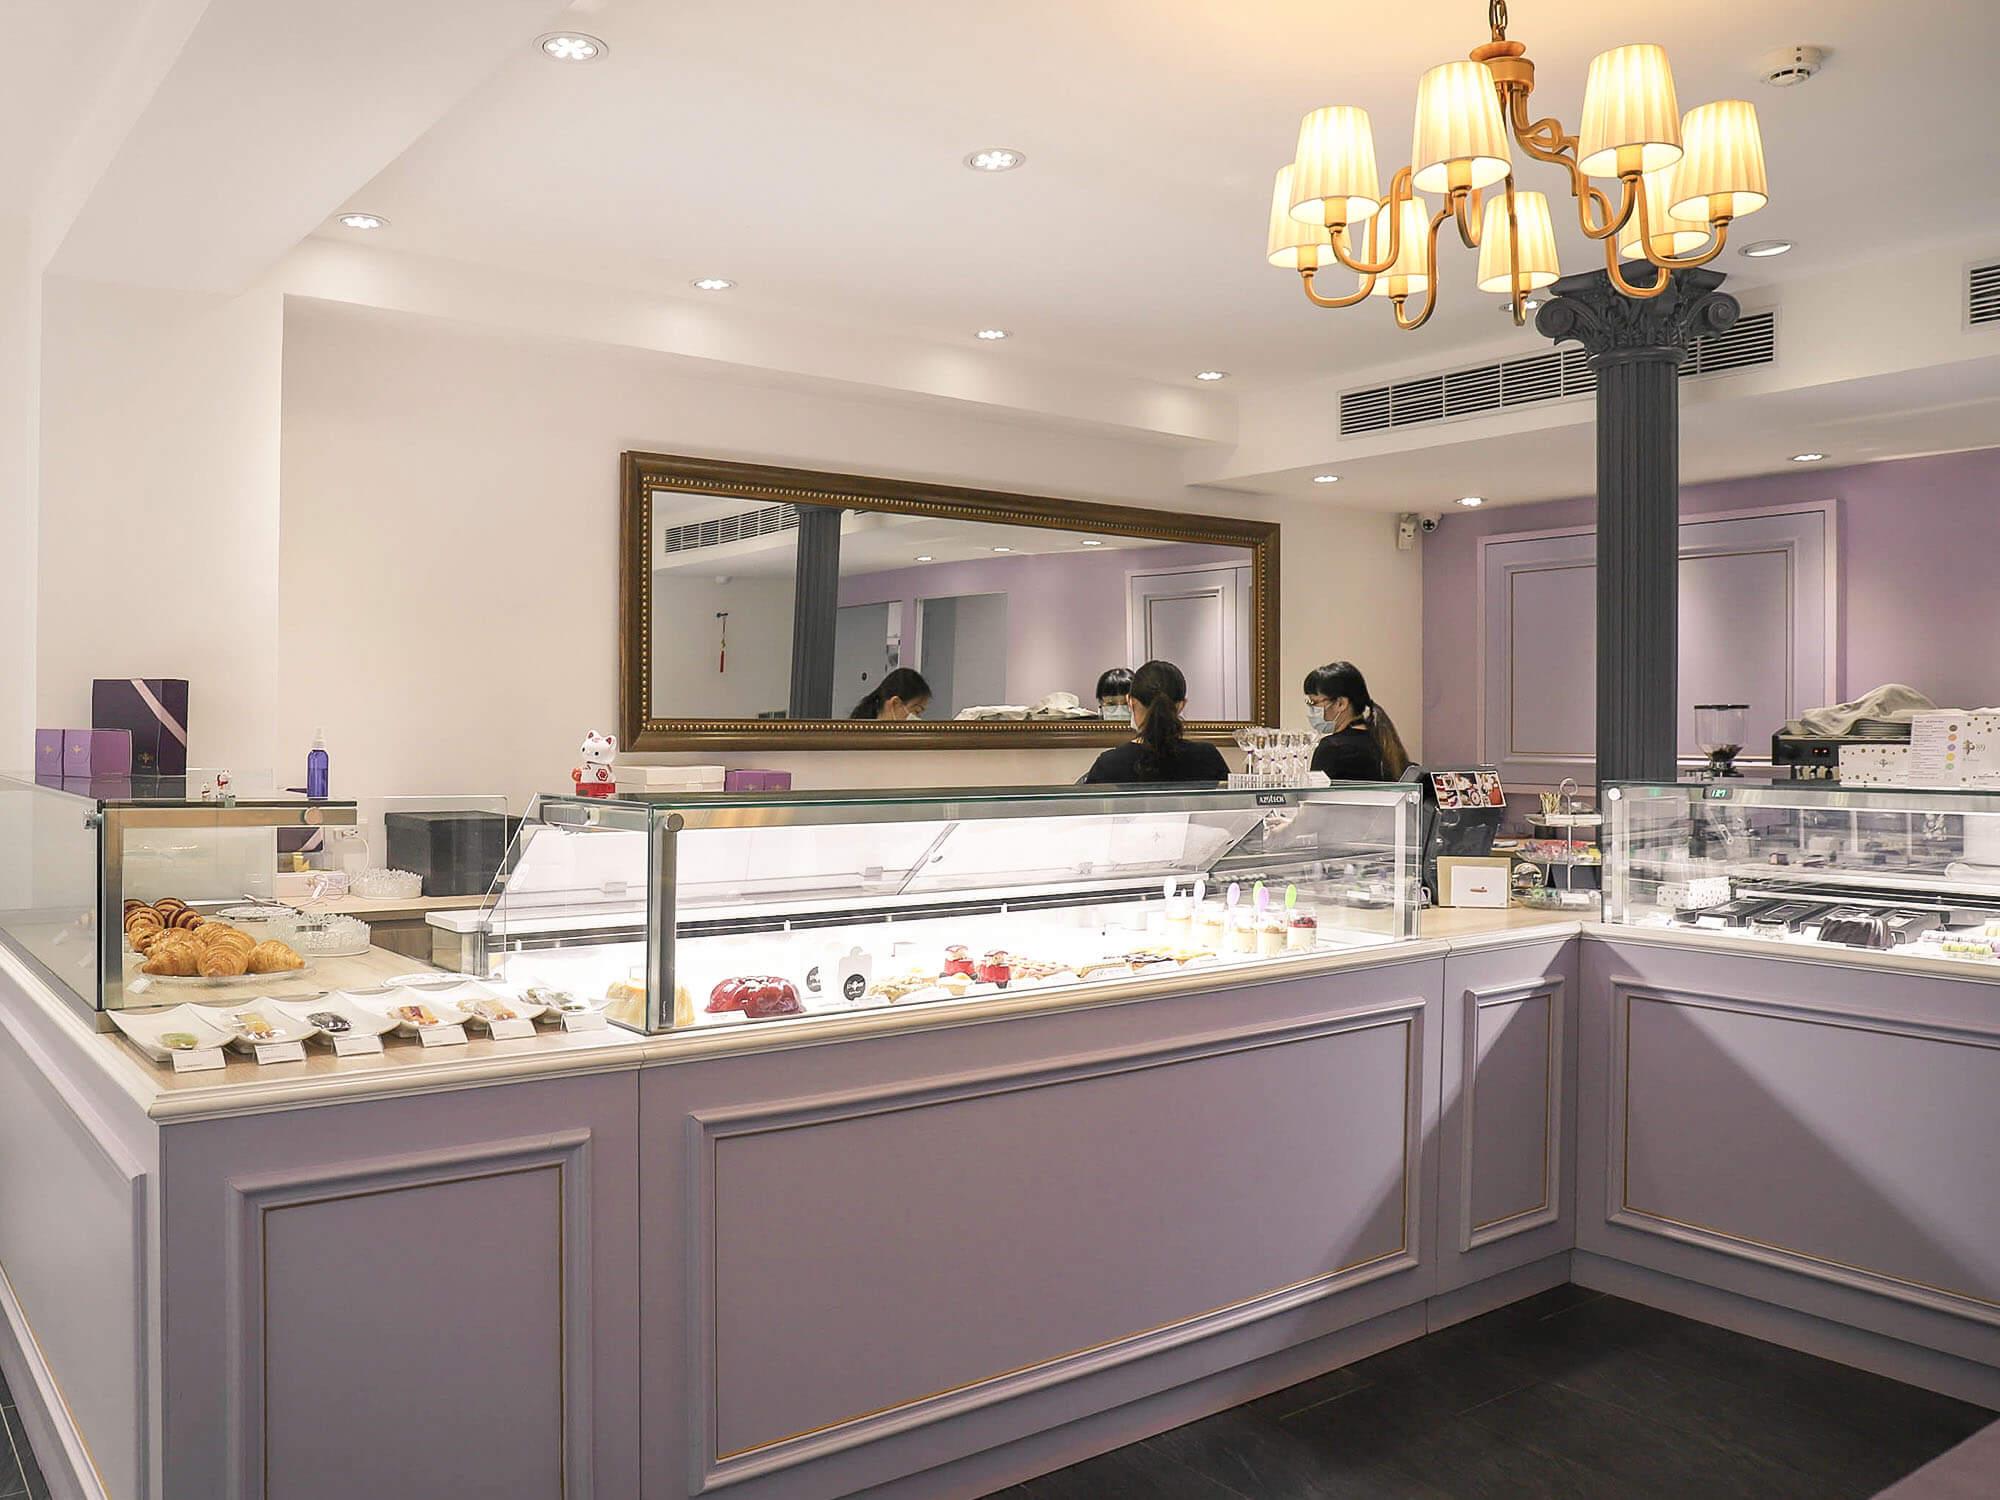 1789 Café Pâtisserie店內櫃檯1